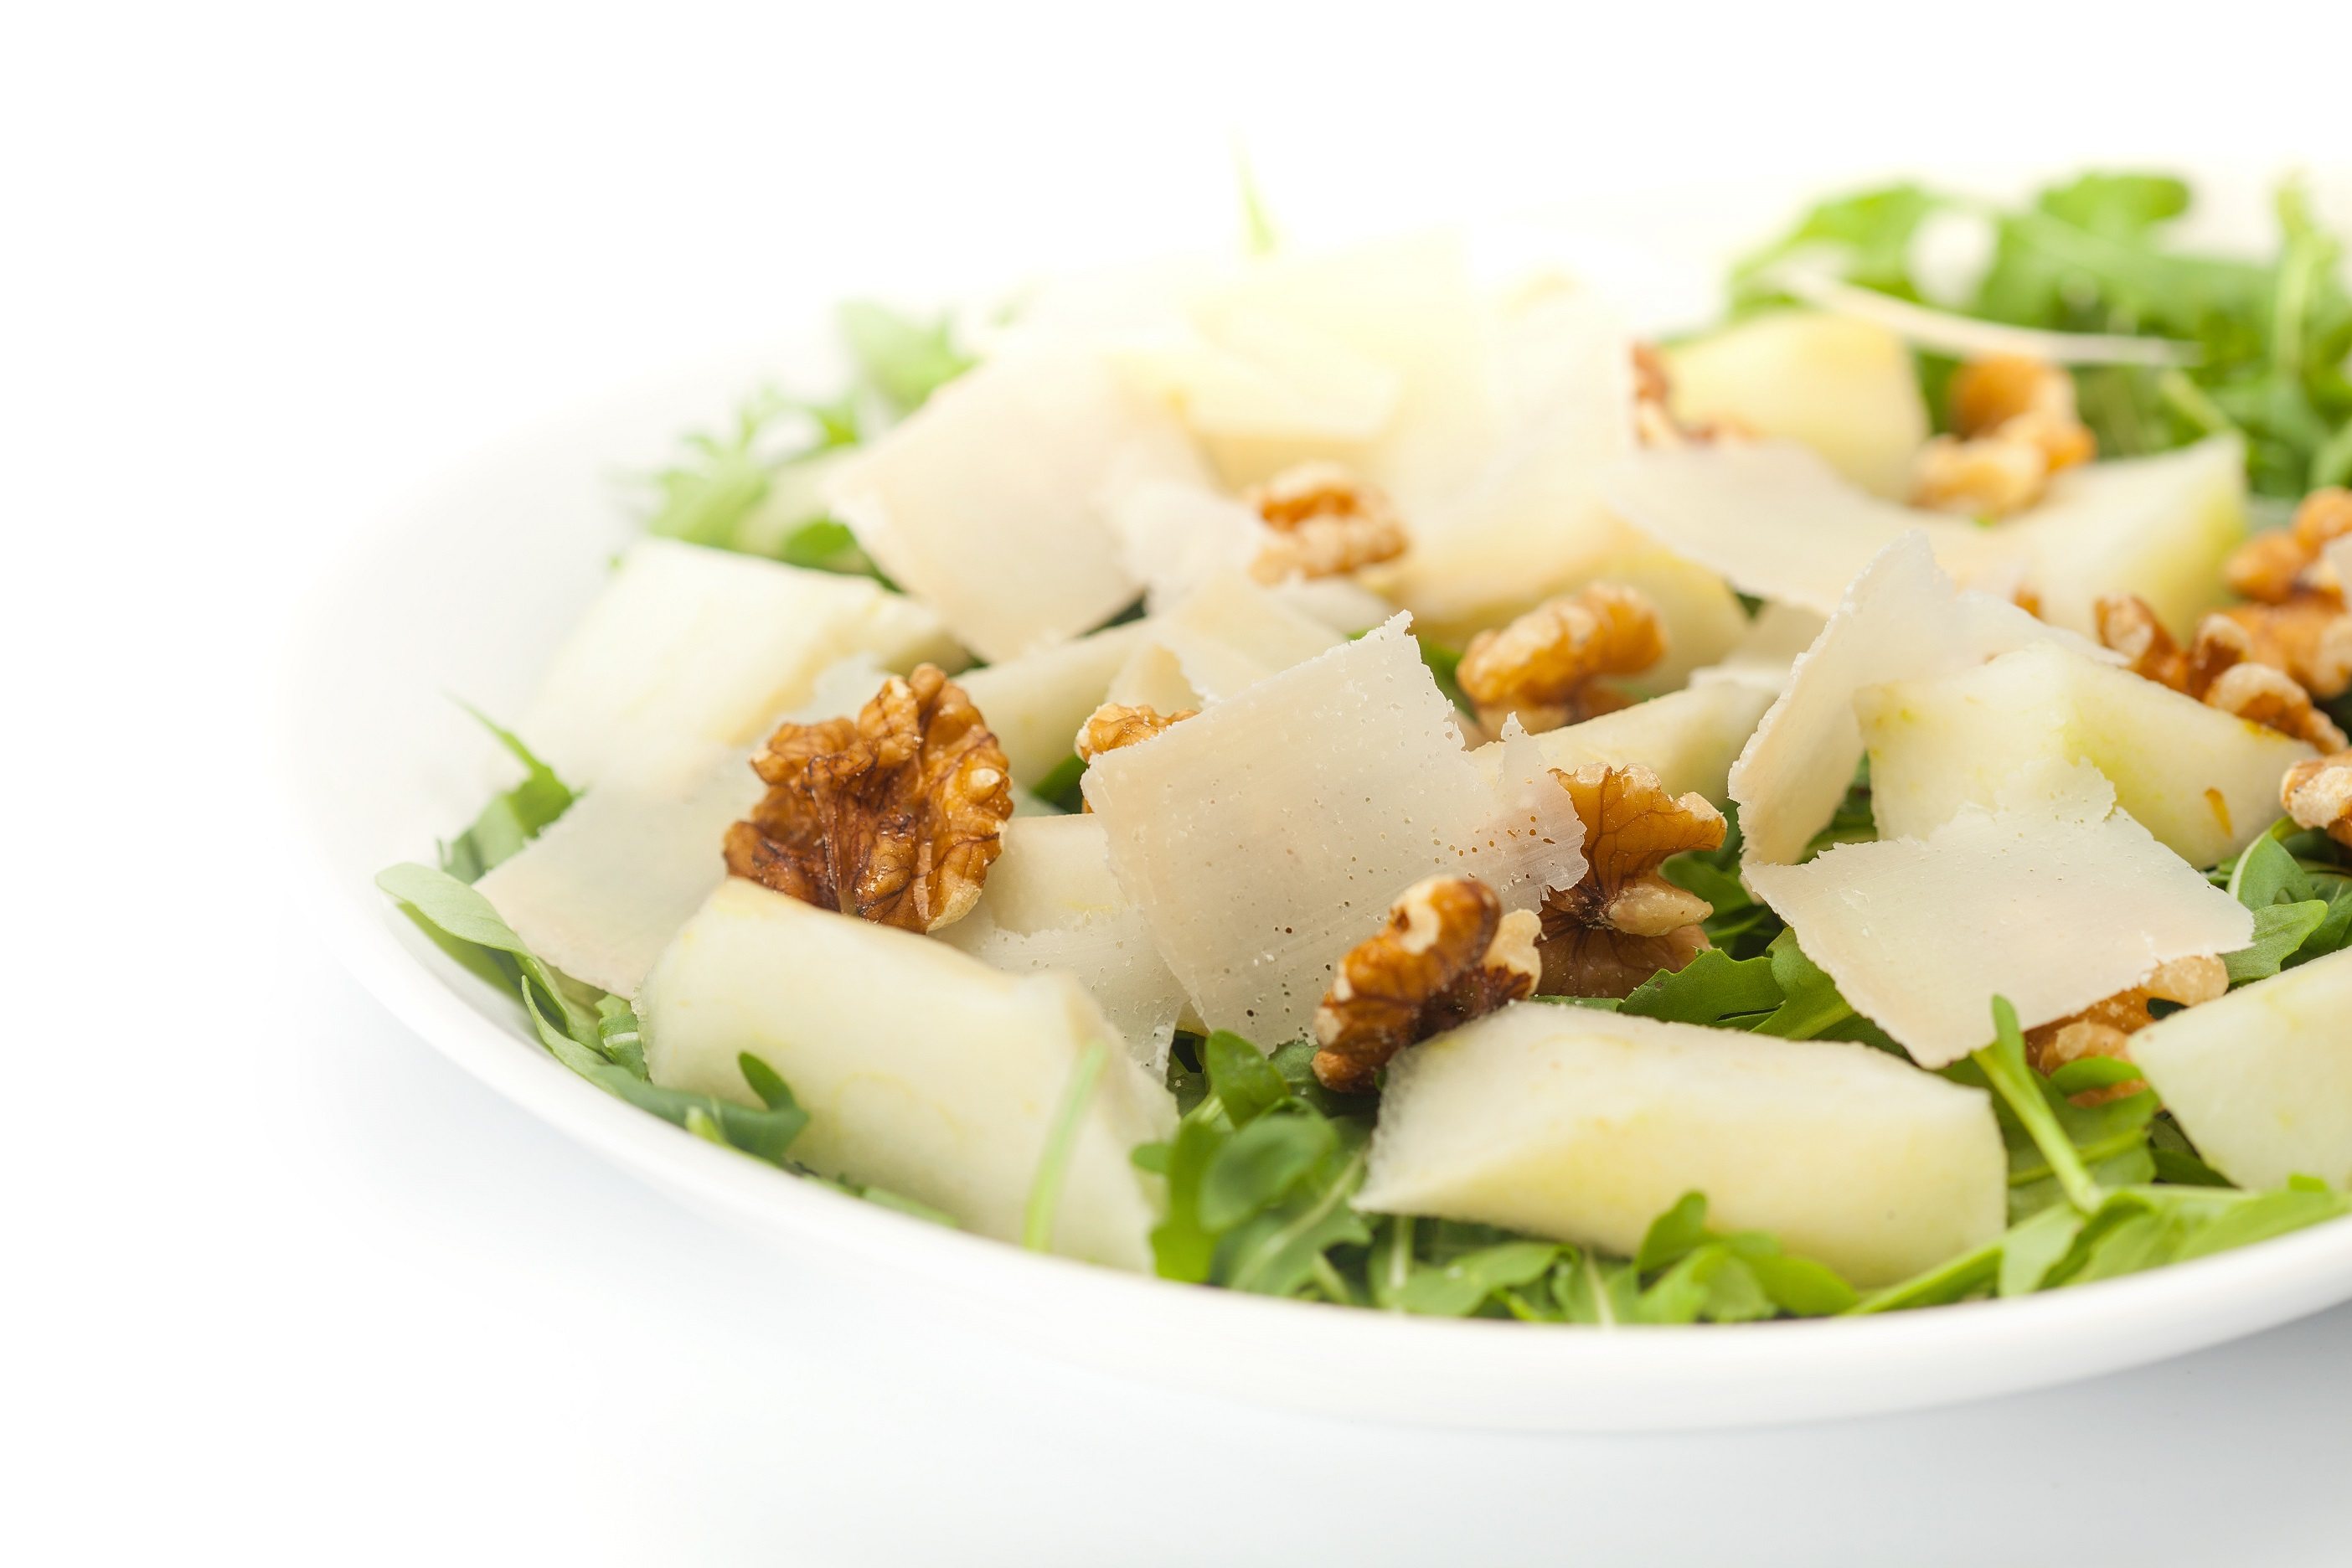 Solata iz rukole, hrušk, orehov in sira Grana Padano